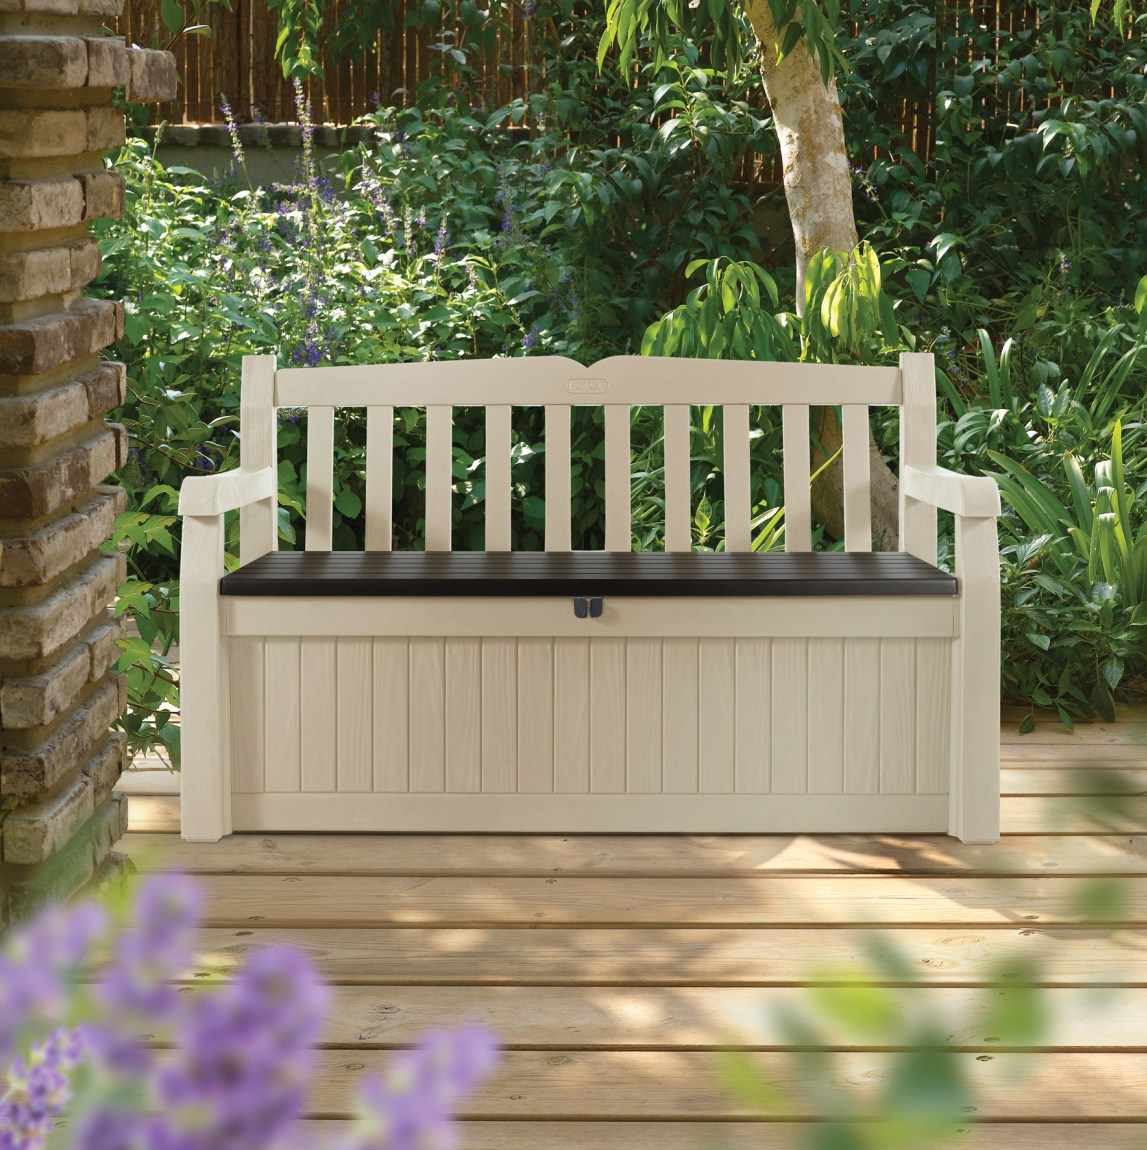 keter eden garden bench oede1 landera outdoor storage and furniture. Black Bedroom Furniture Sets. Home Design Ideas